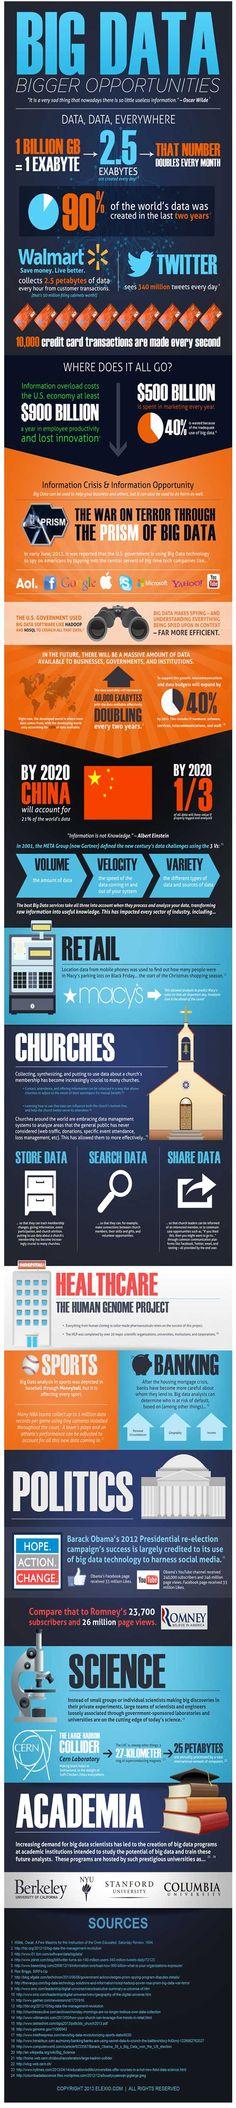 infographic-big-data